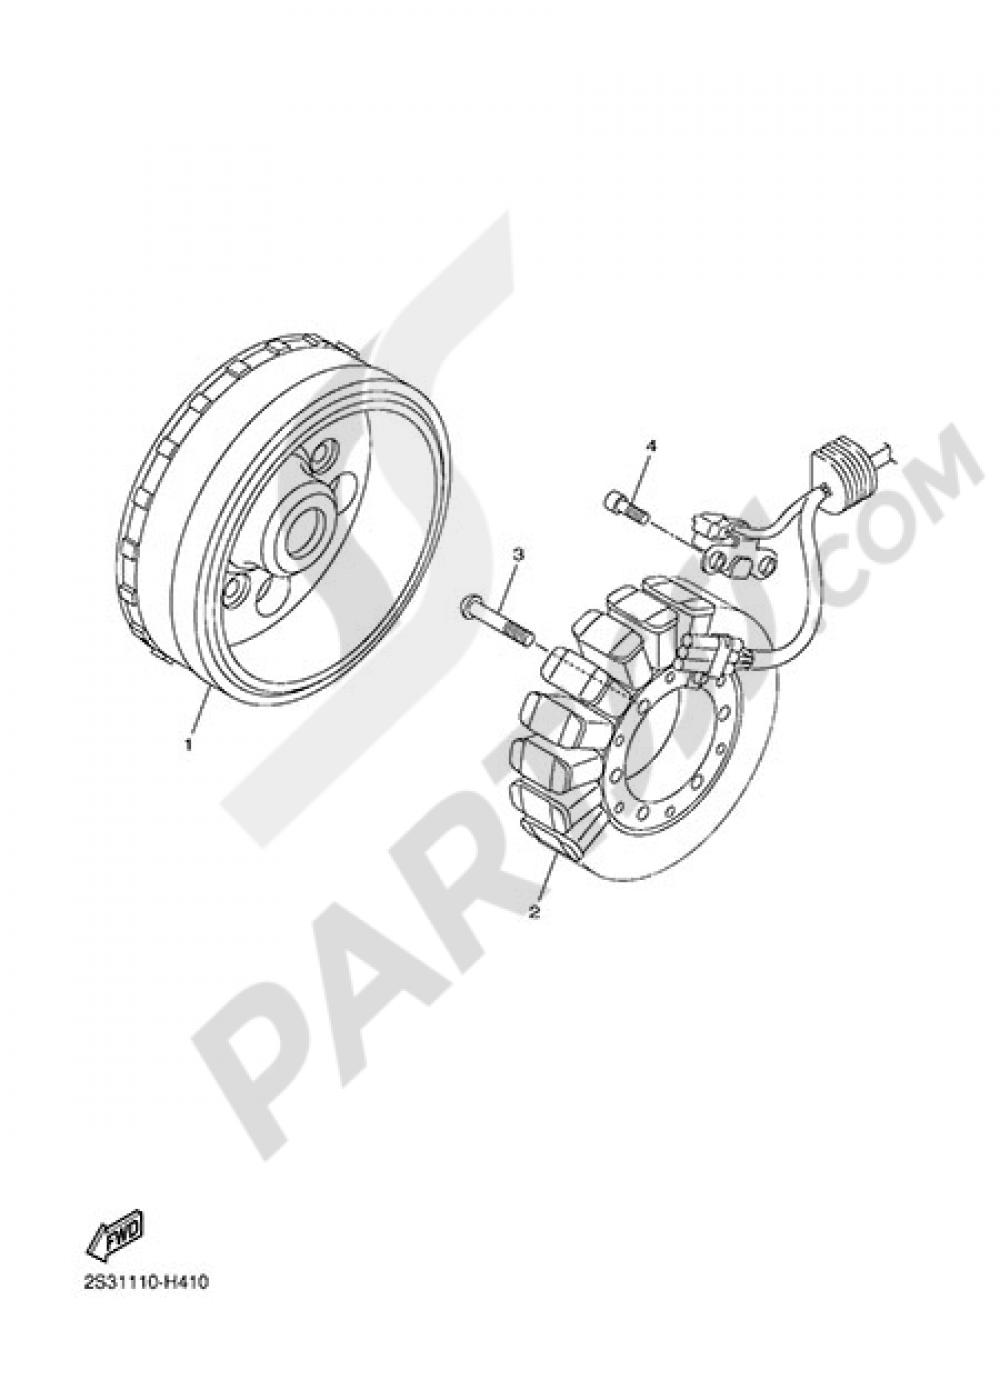 GENERATOR Yamaha VMAX CARBON 2015